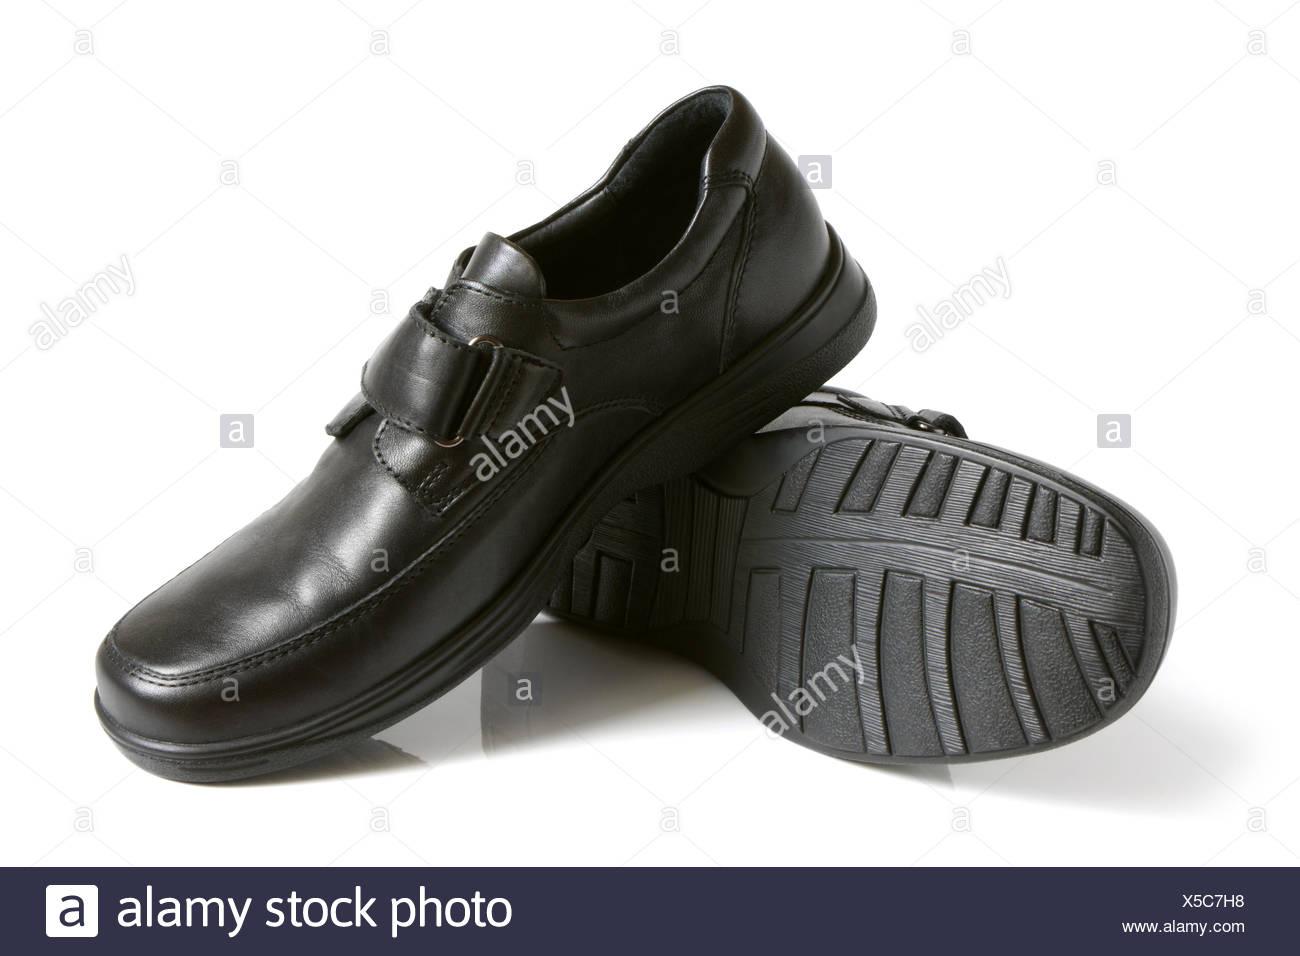 Black shoes - Stock Image